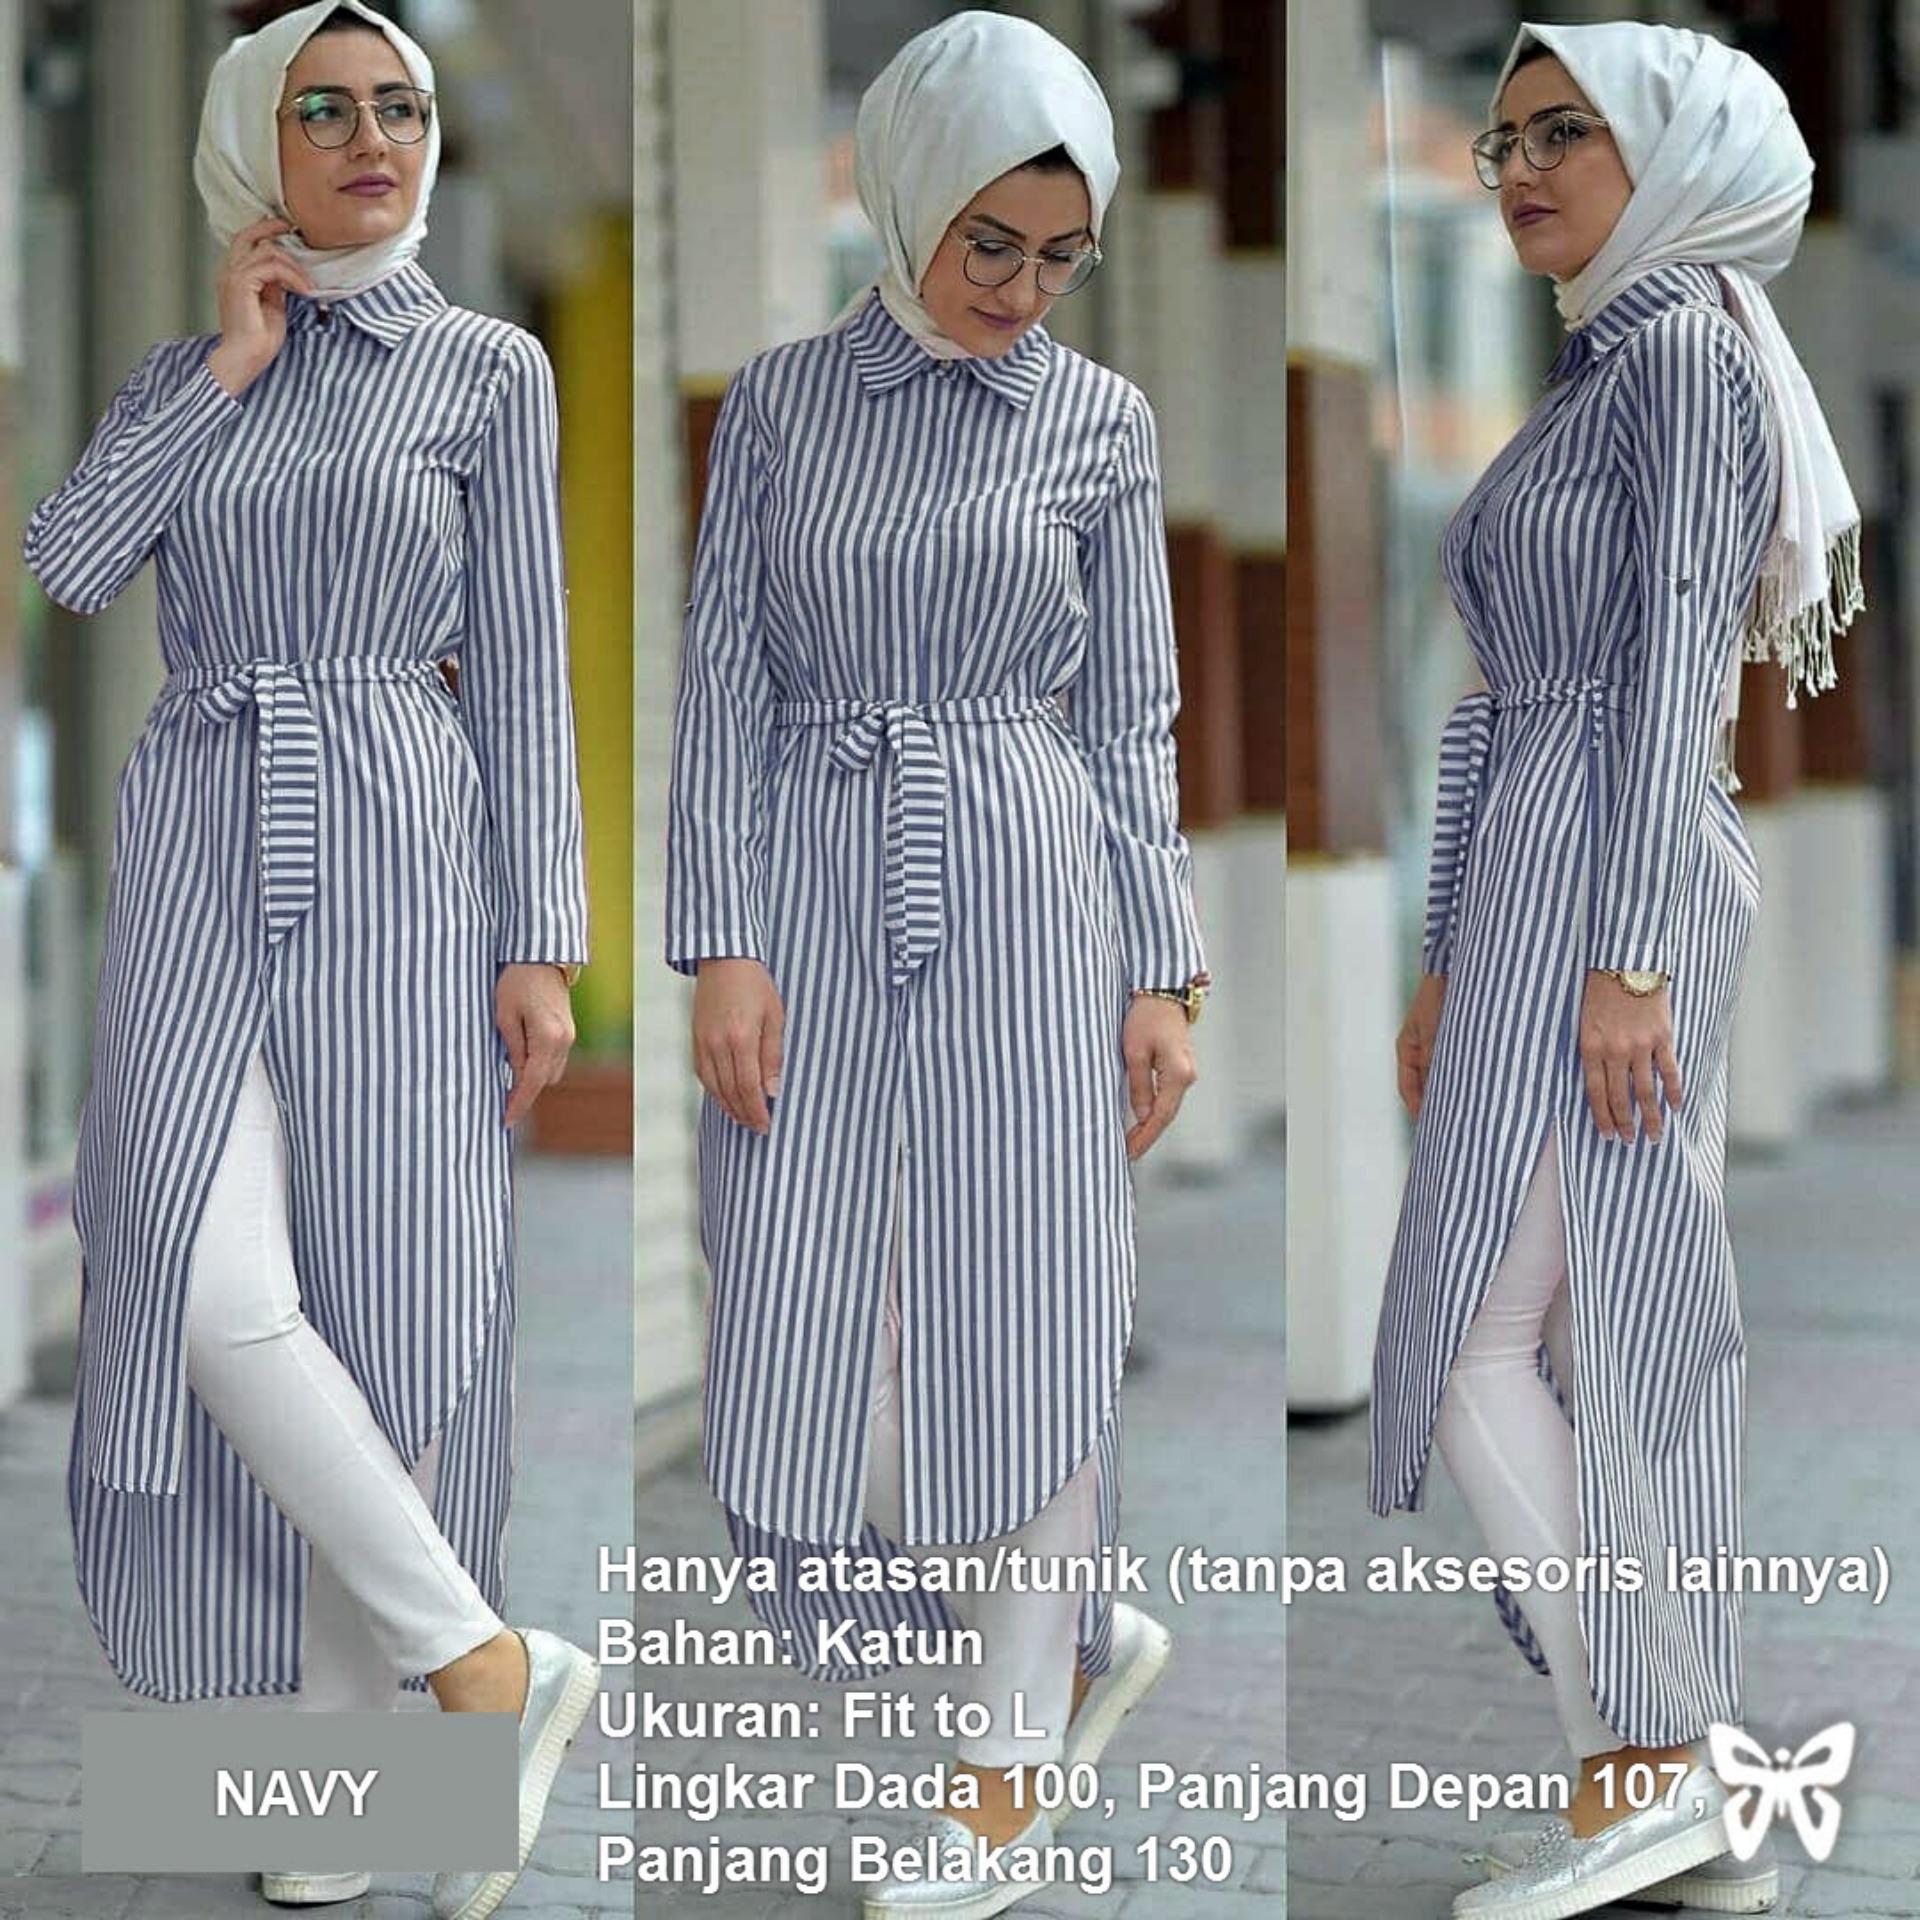 Kemeja Tunik Wanita Lengan Panjang Pinguin Busui Salur MSR279   Atasan  Muslimah   Baju Muslim   d42c6054ab